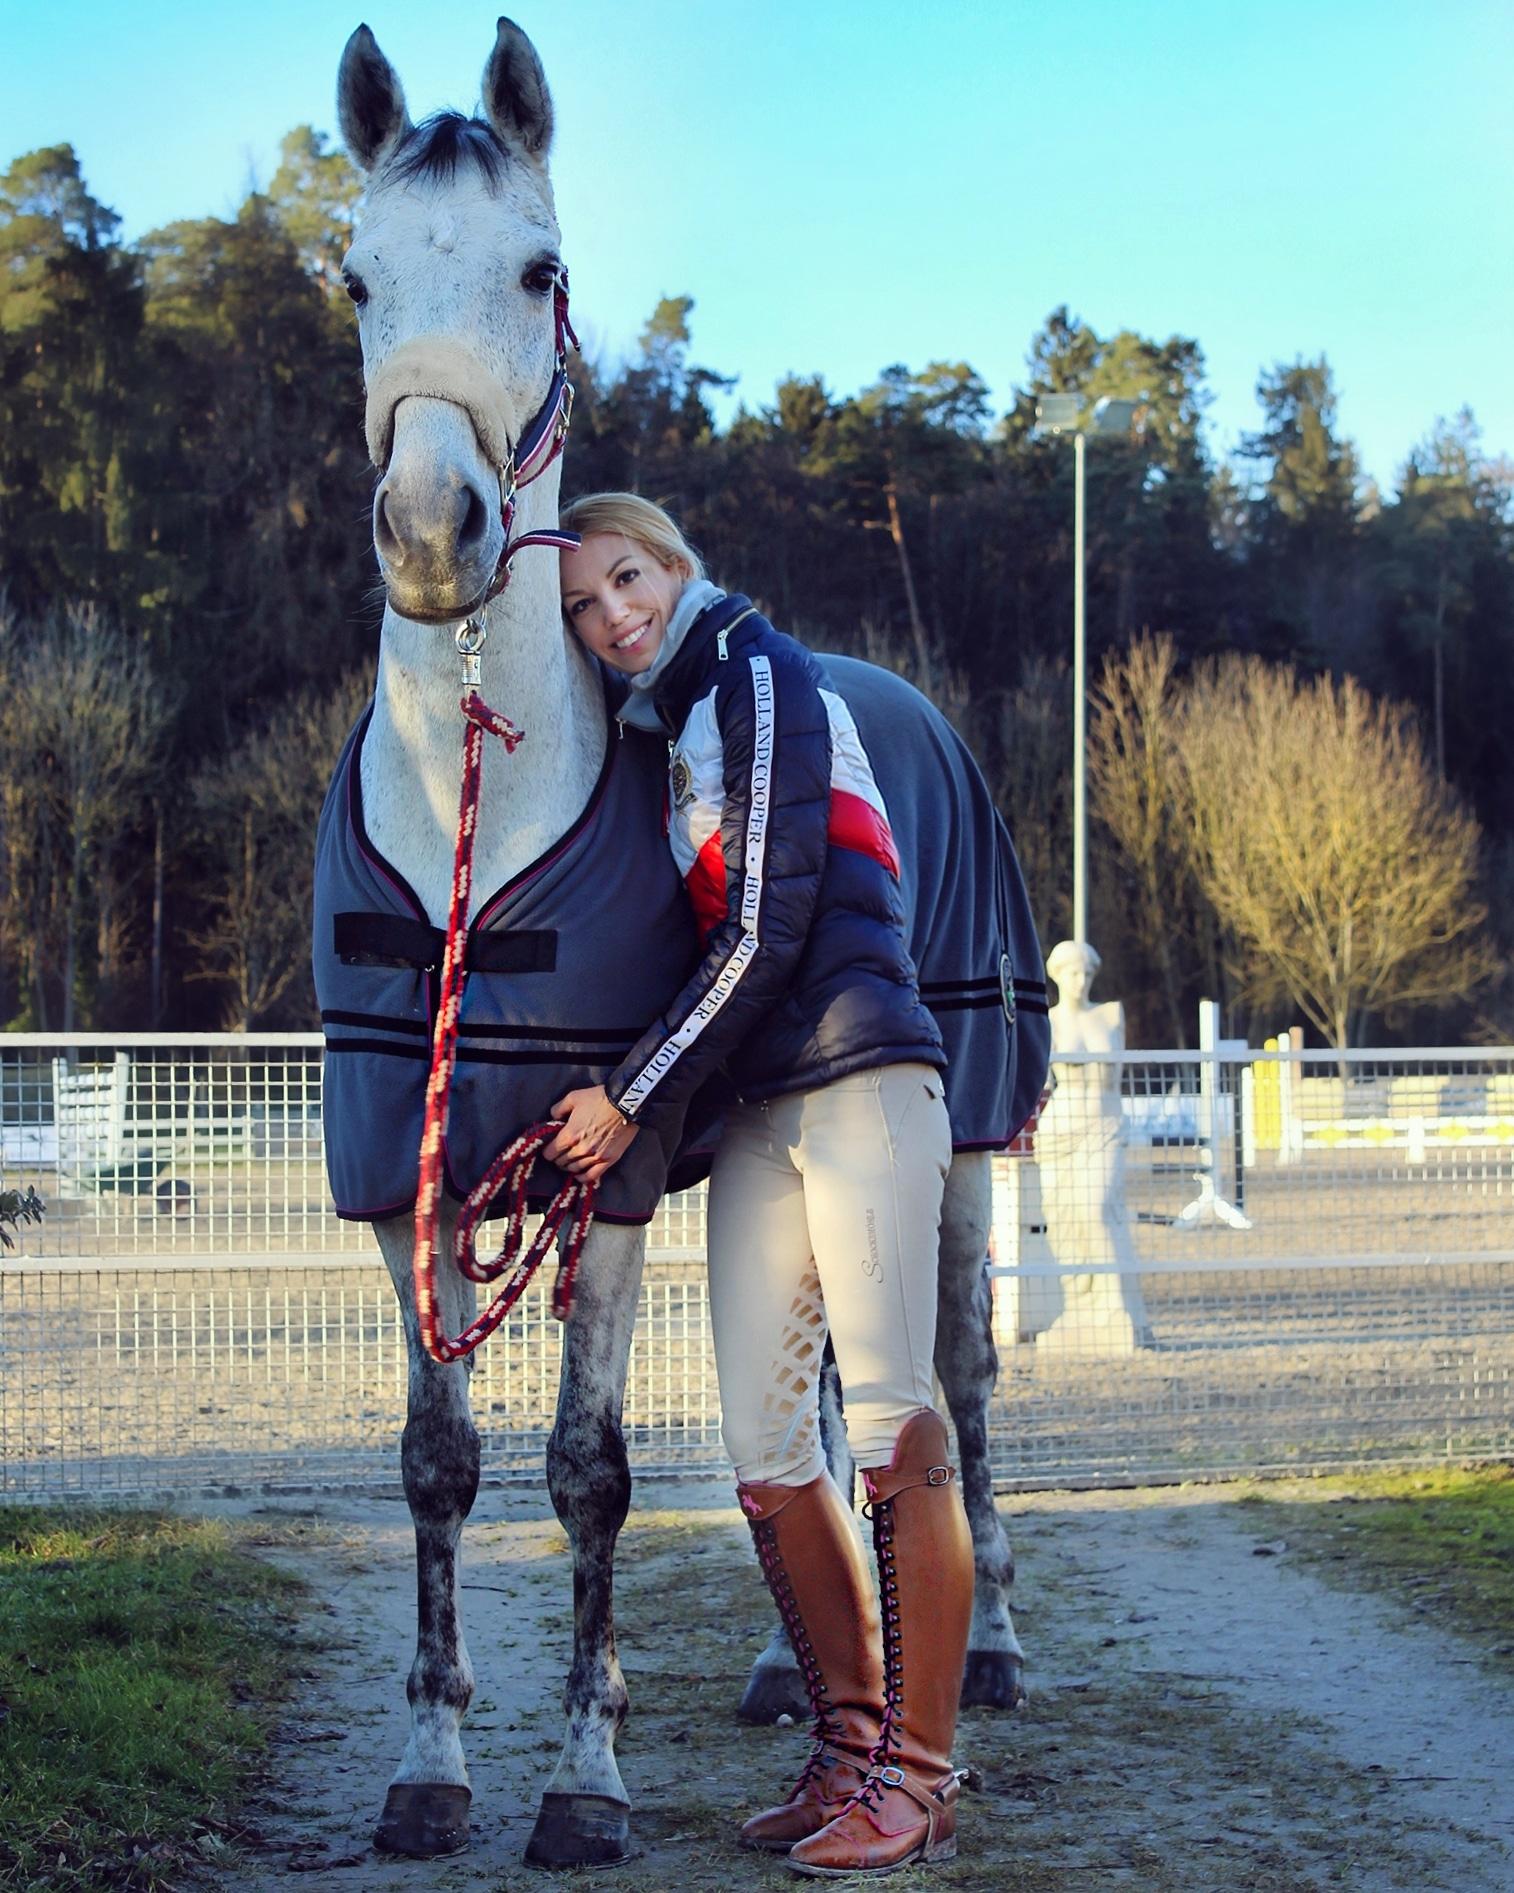 The Stylish Equestrian